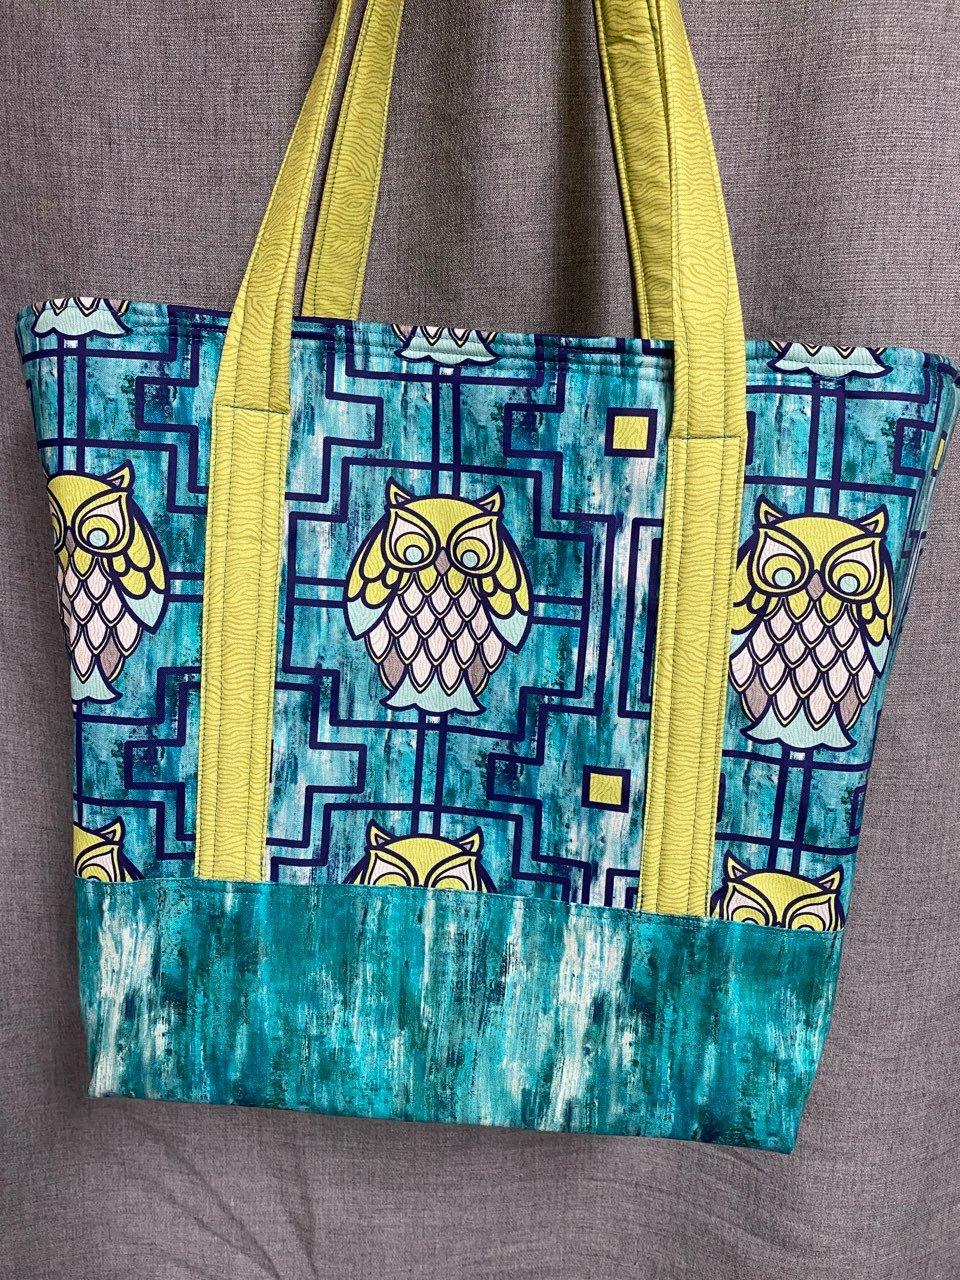 Nocturnal Tourist Tote Bag Kit